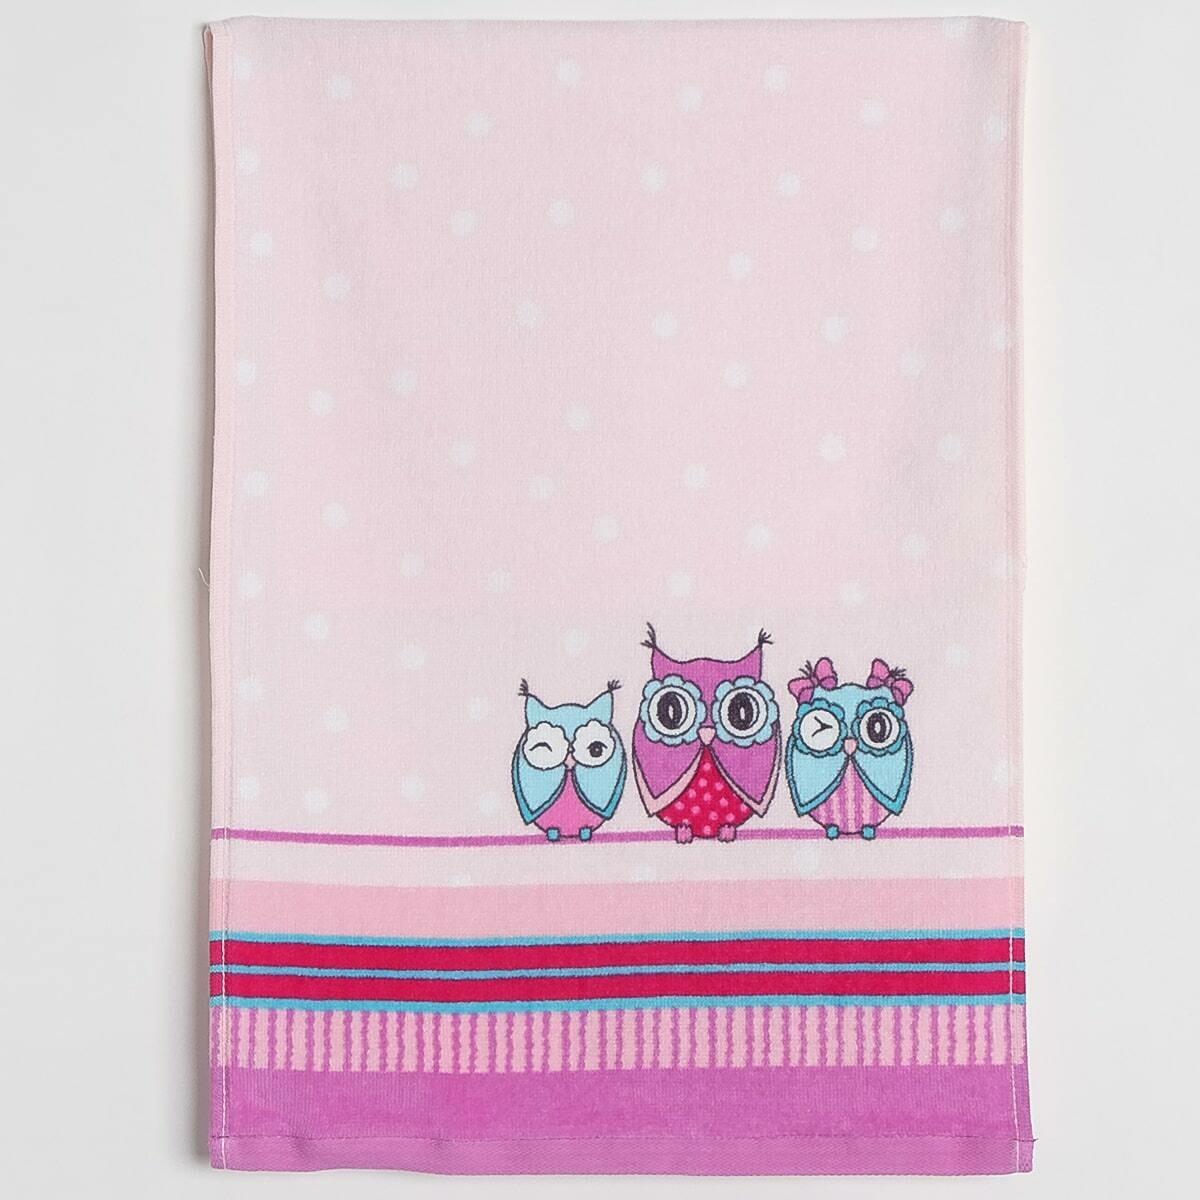 Махровое полотенце, Совушки, 33*70 см